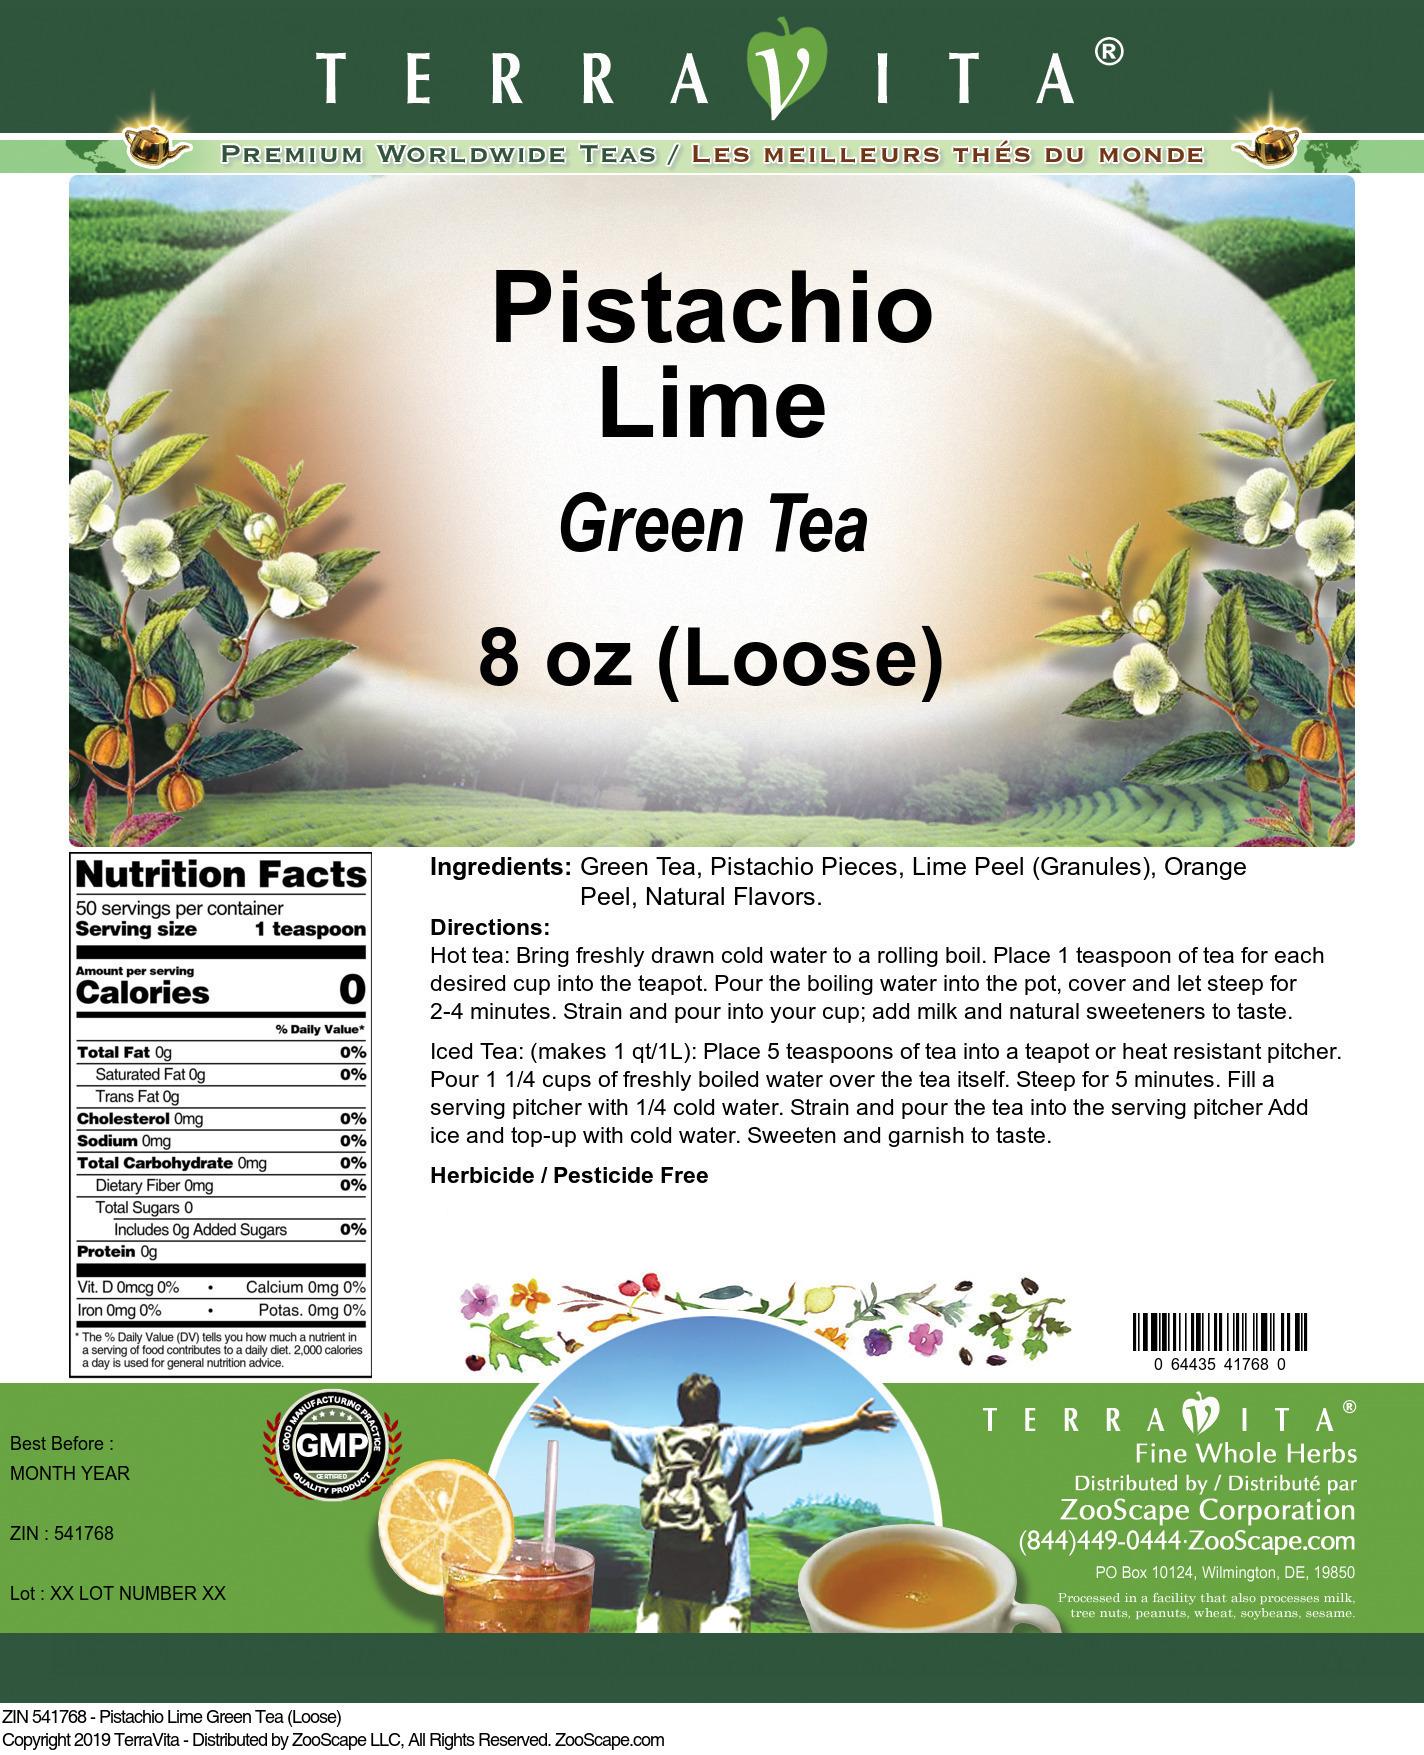 Pistachio Lime Green Tea (Loose)